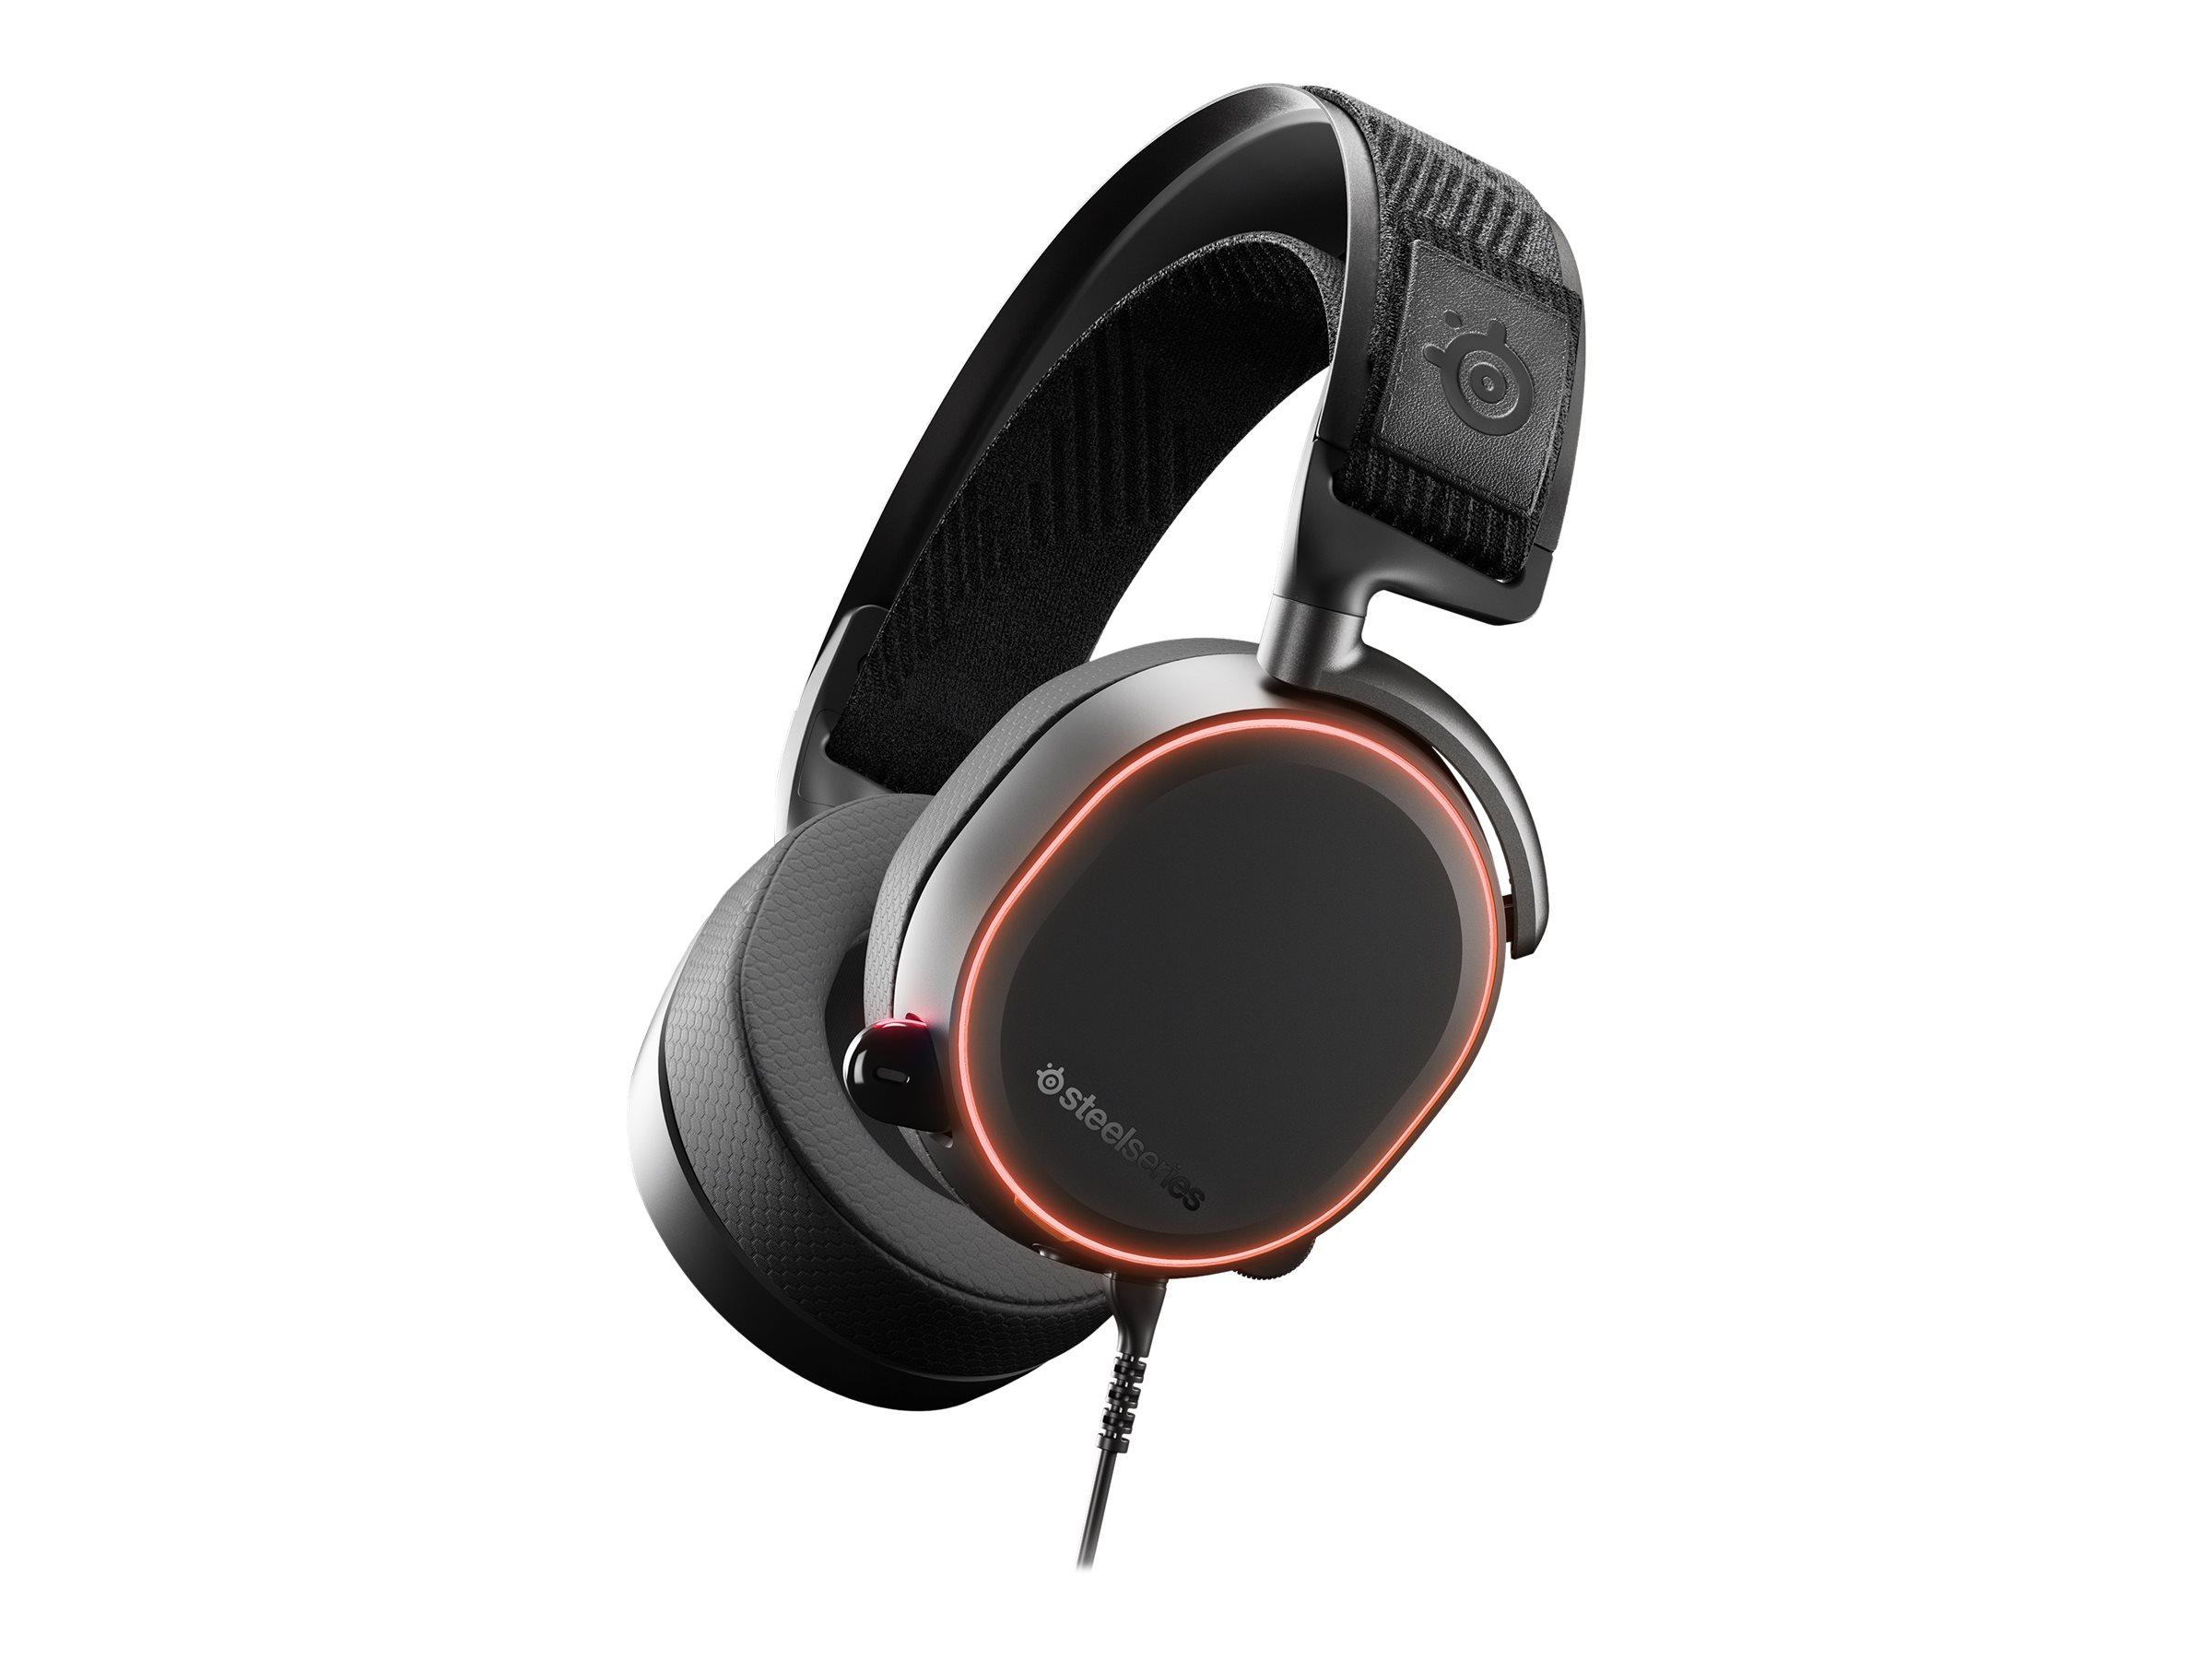 SteelSeries Arctis Pro - Headset - Full-Size - kabelgebunden - USB, 3,5 mm Stecker